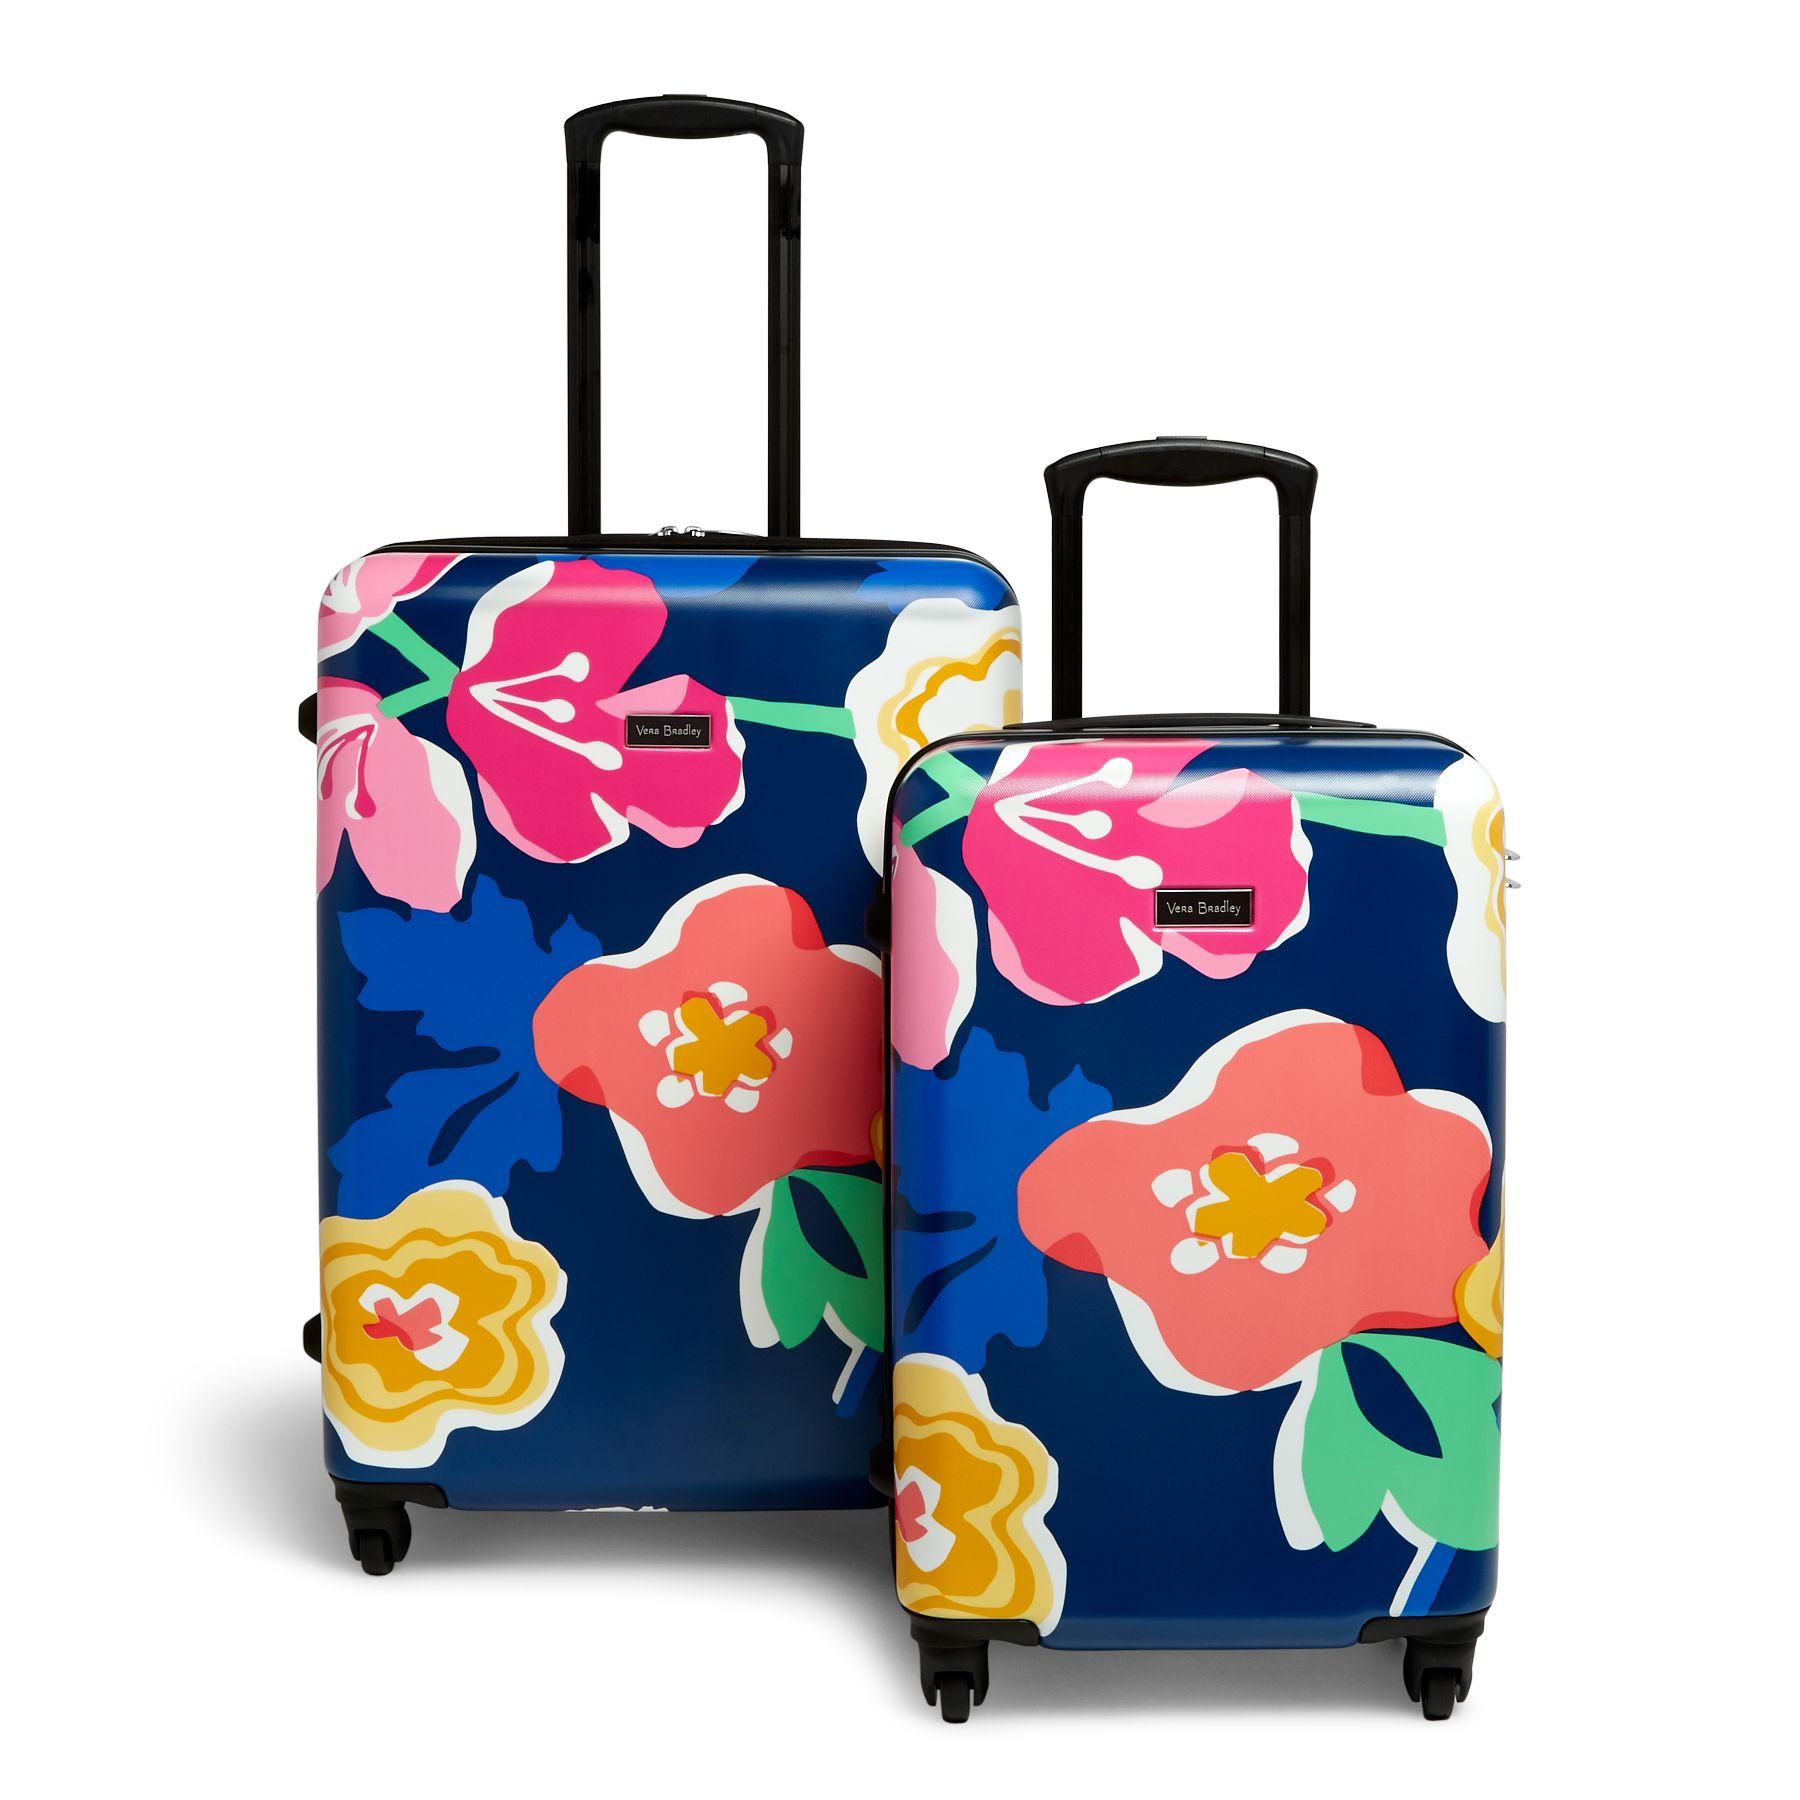 hardside spinner luggage set